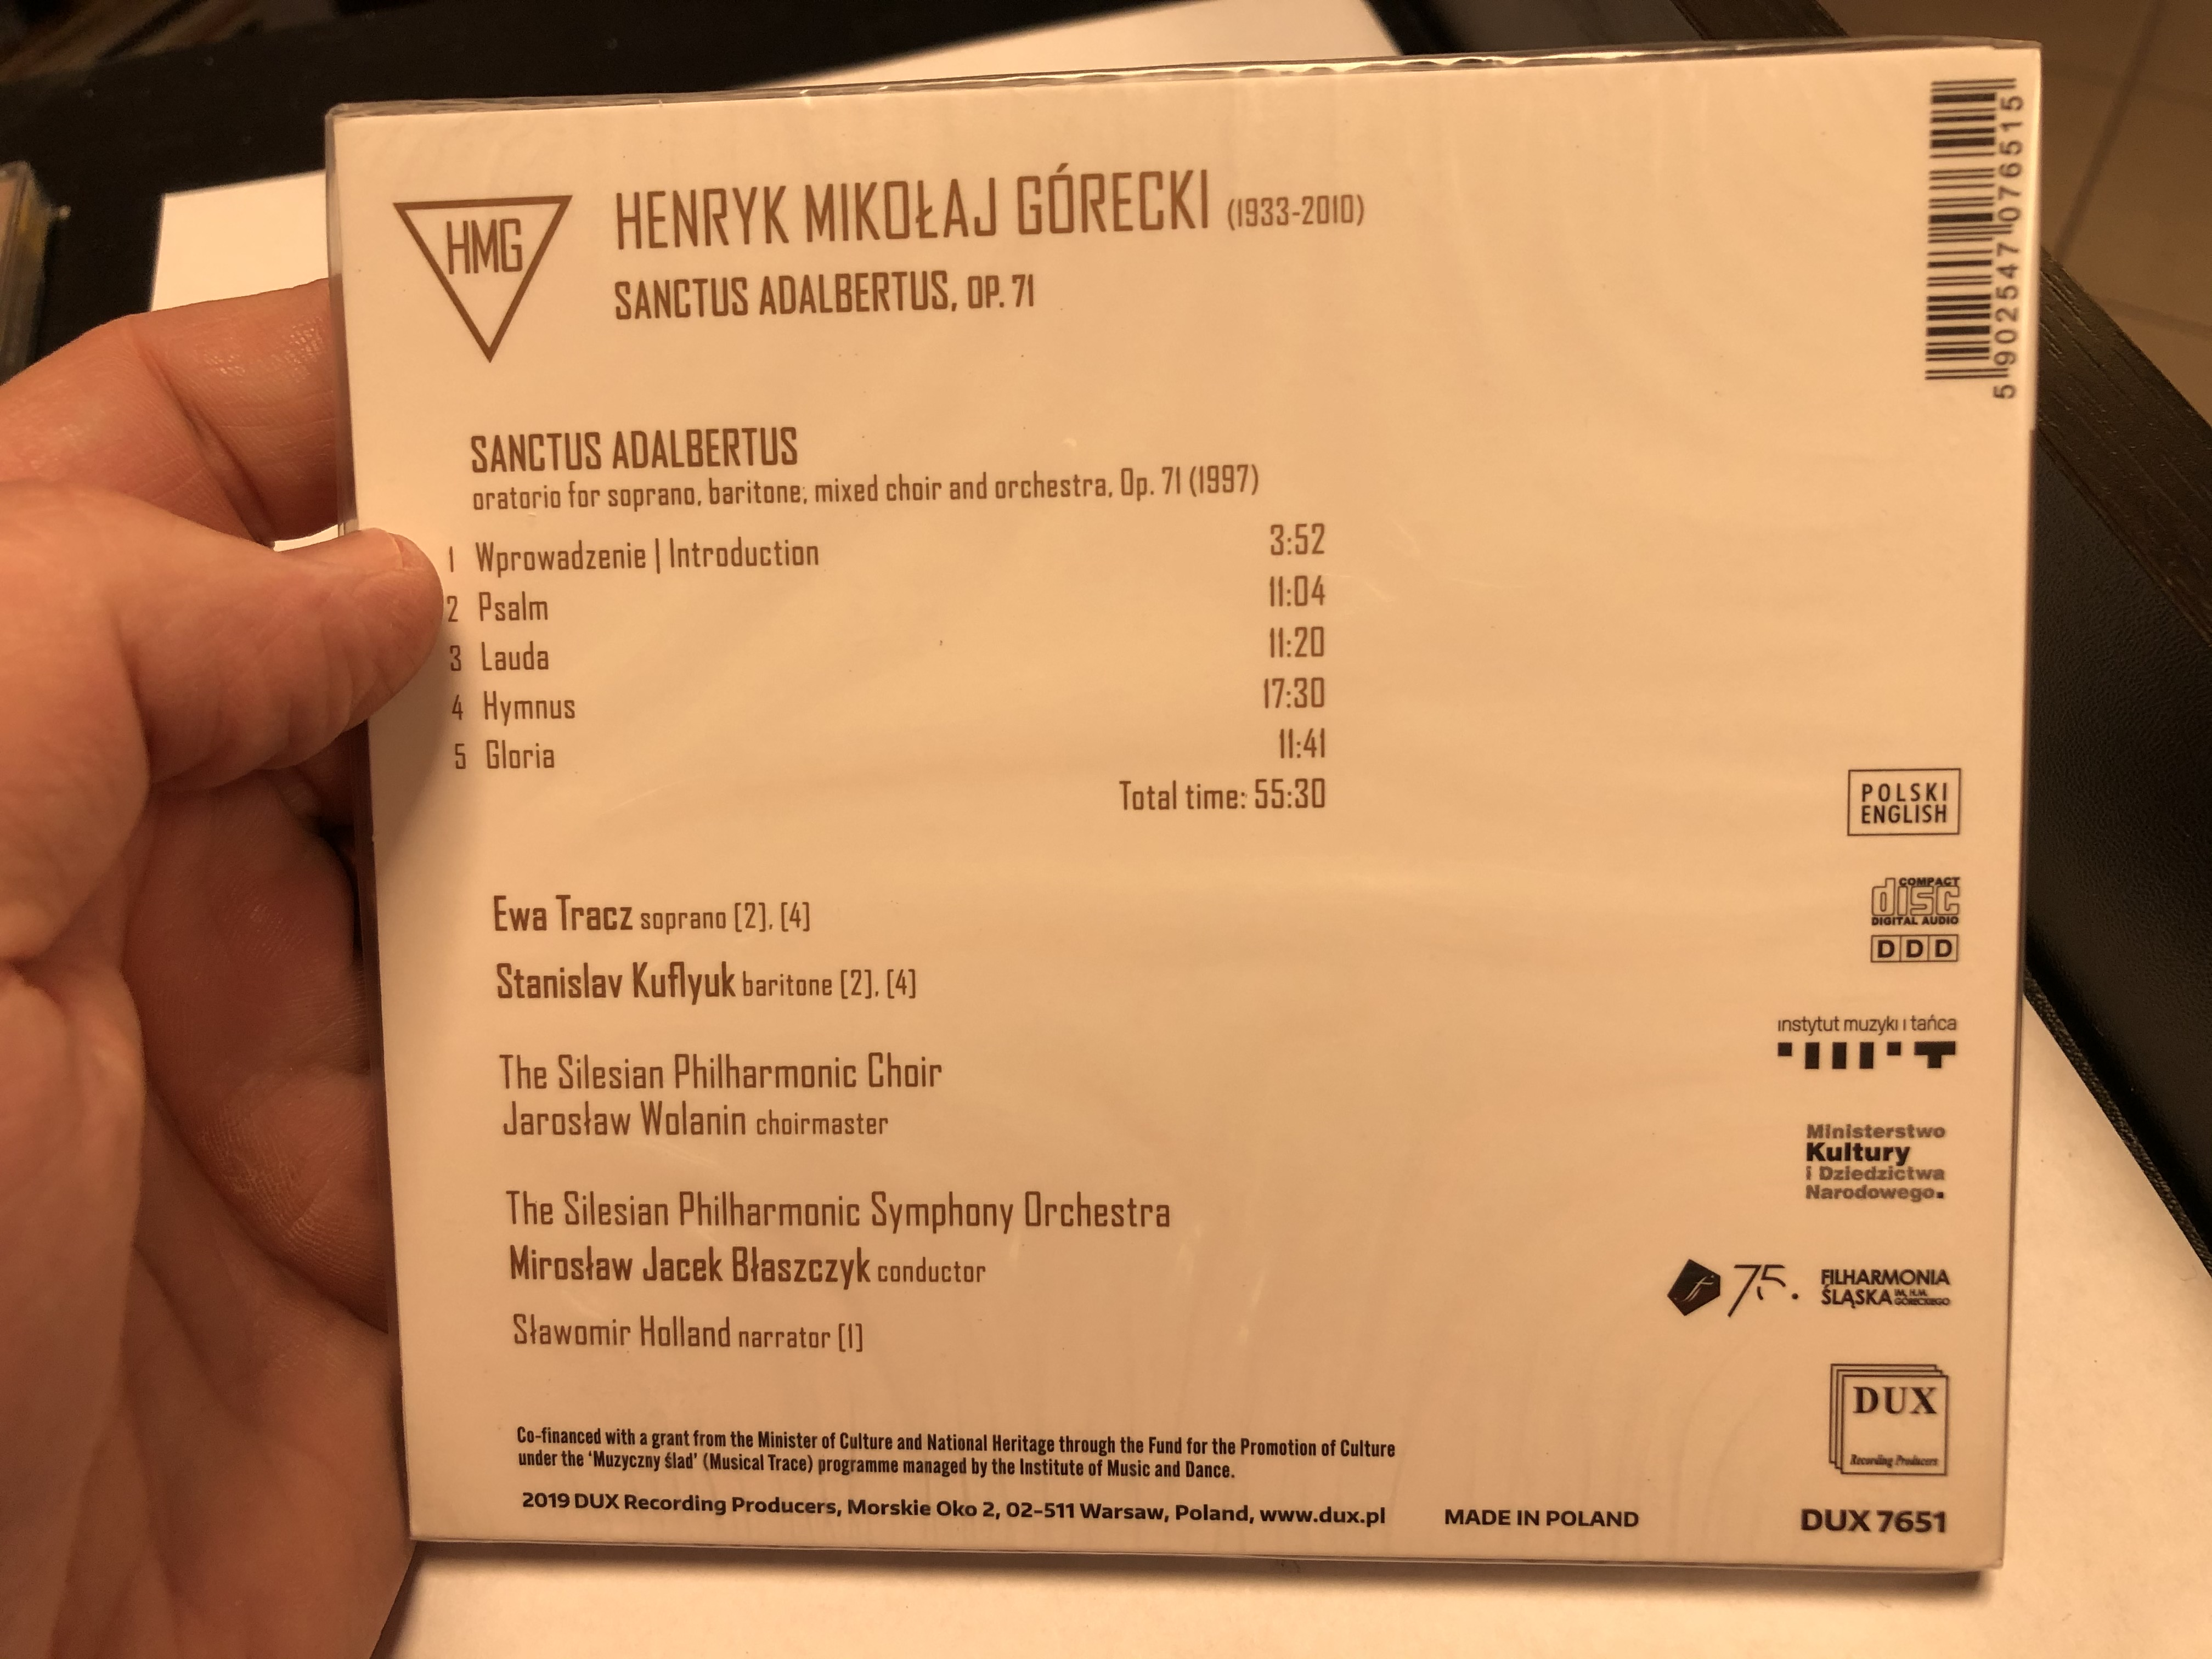 gorecki-henryk-mikolaj-sanctus-adalbertus-op.-71-the-silesian-philharmonic-choir-the-silesian-philharmonic-symphony-orchestra-miroslaw-jacek-blaszczyk-conductor-ewa-tracz-soprano-.jpg